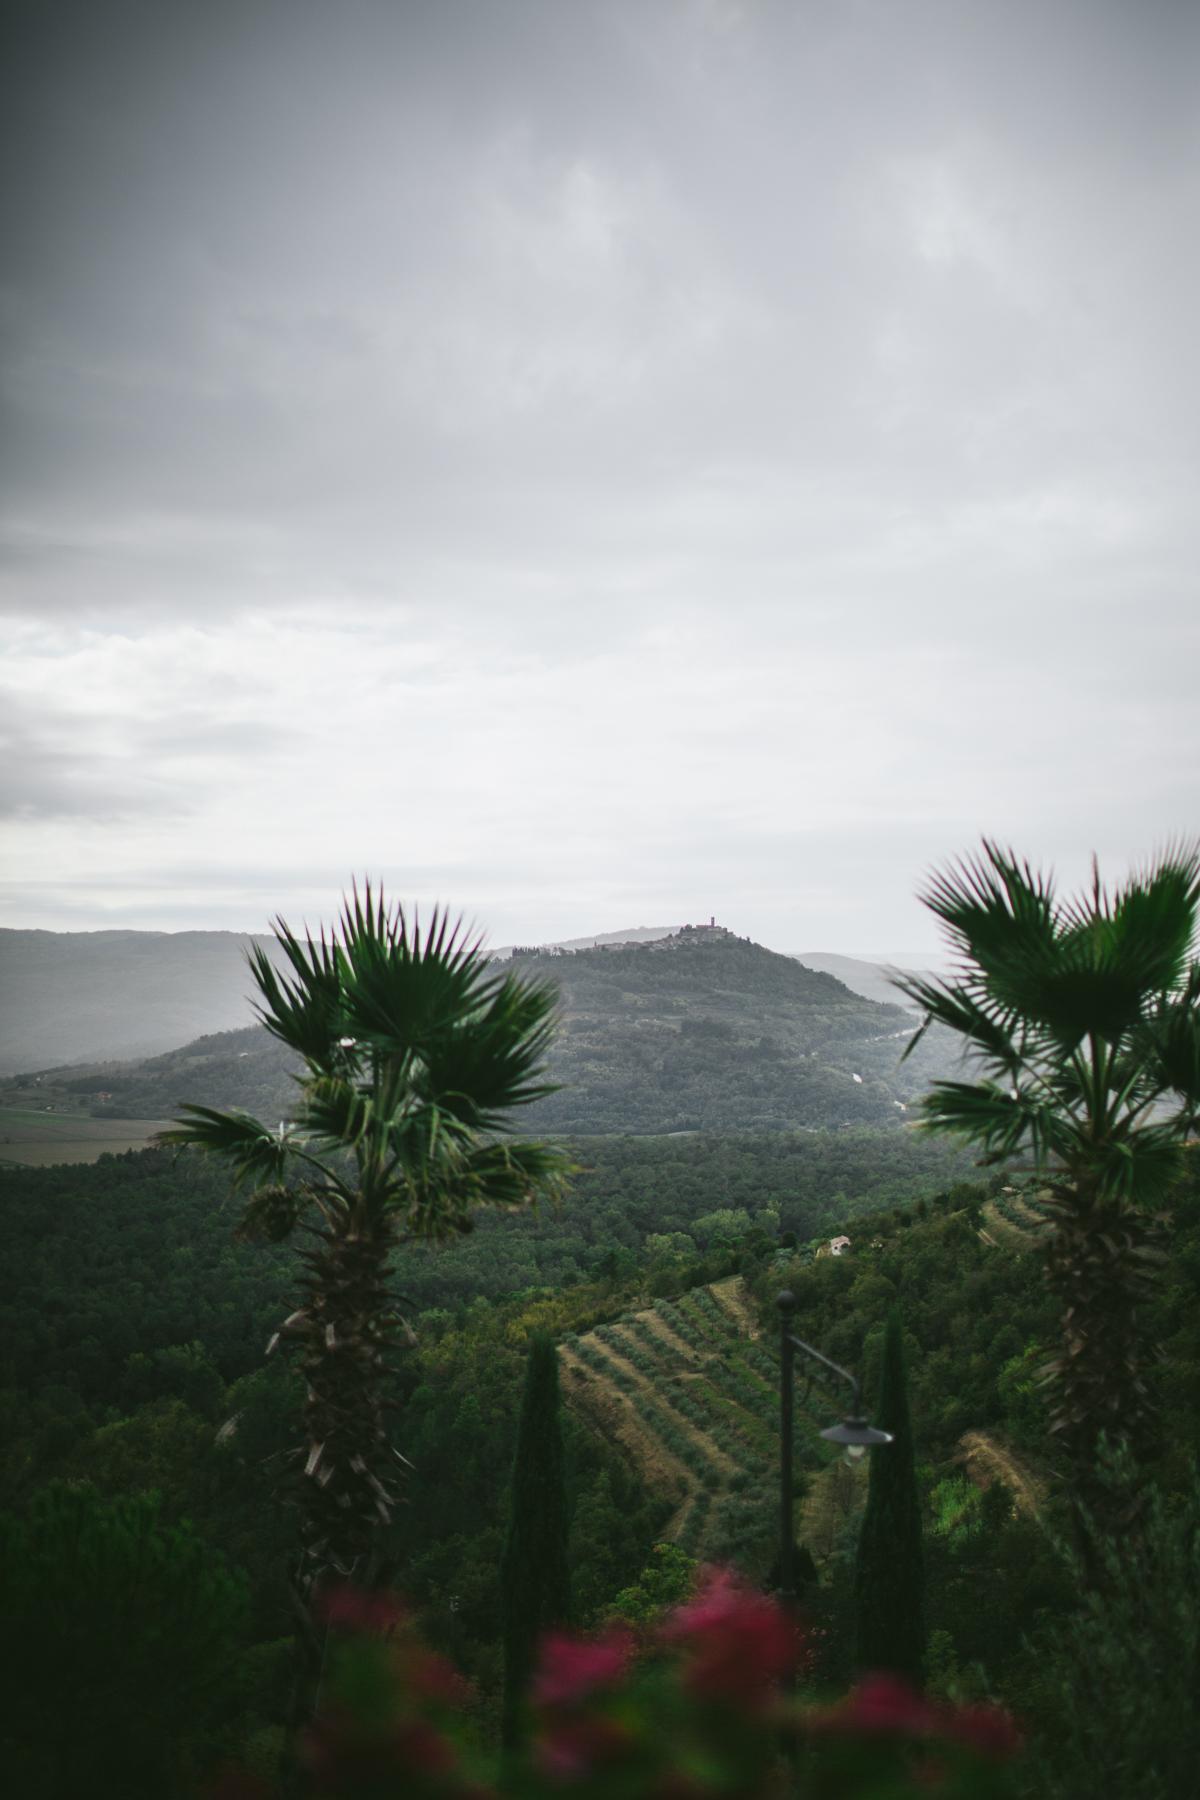 croatia photography workshop with eva kosmas flores-2.jpeg